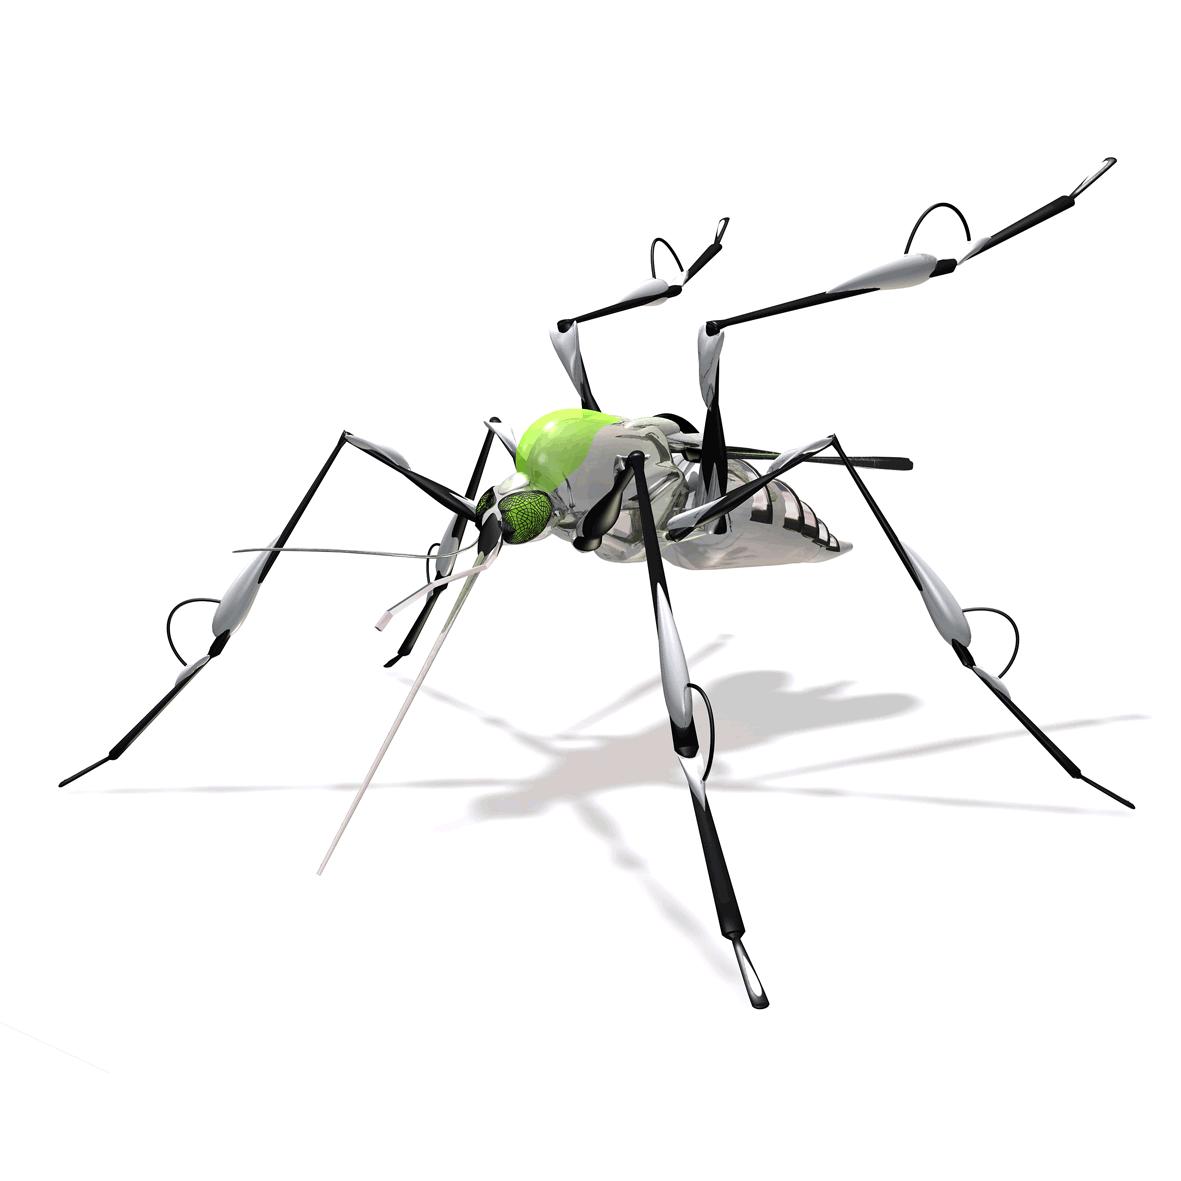 MOSQUITOS / MOSQUITO / MOUSTIQUES / MÜCKEN / ZANZARE / MOSQUITS Mosquitos